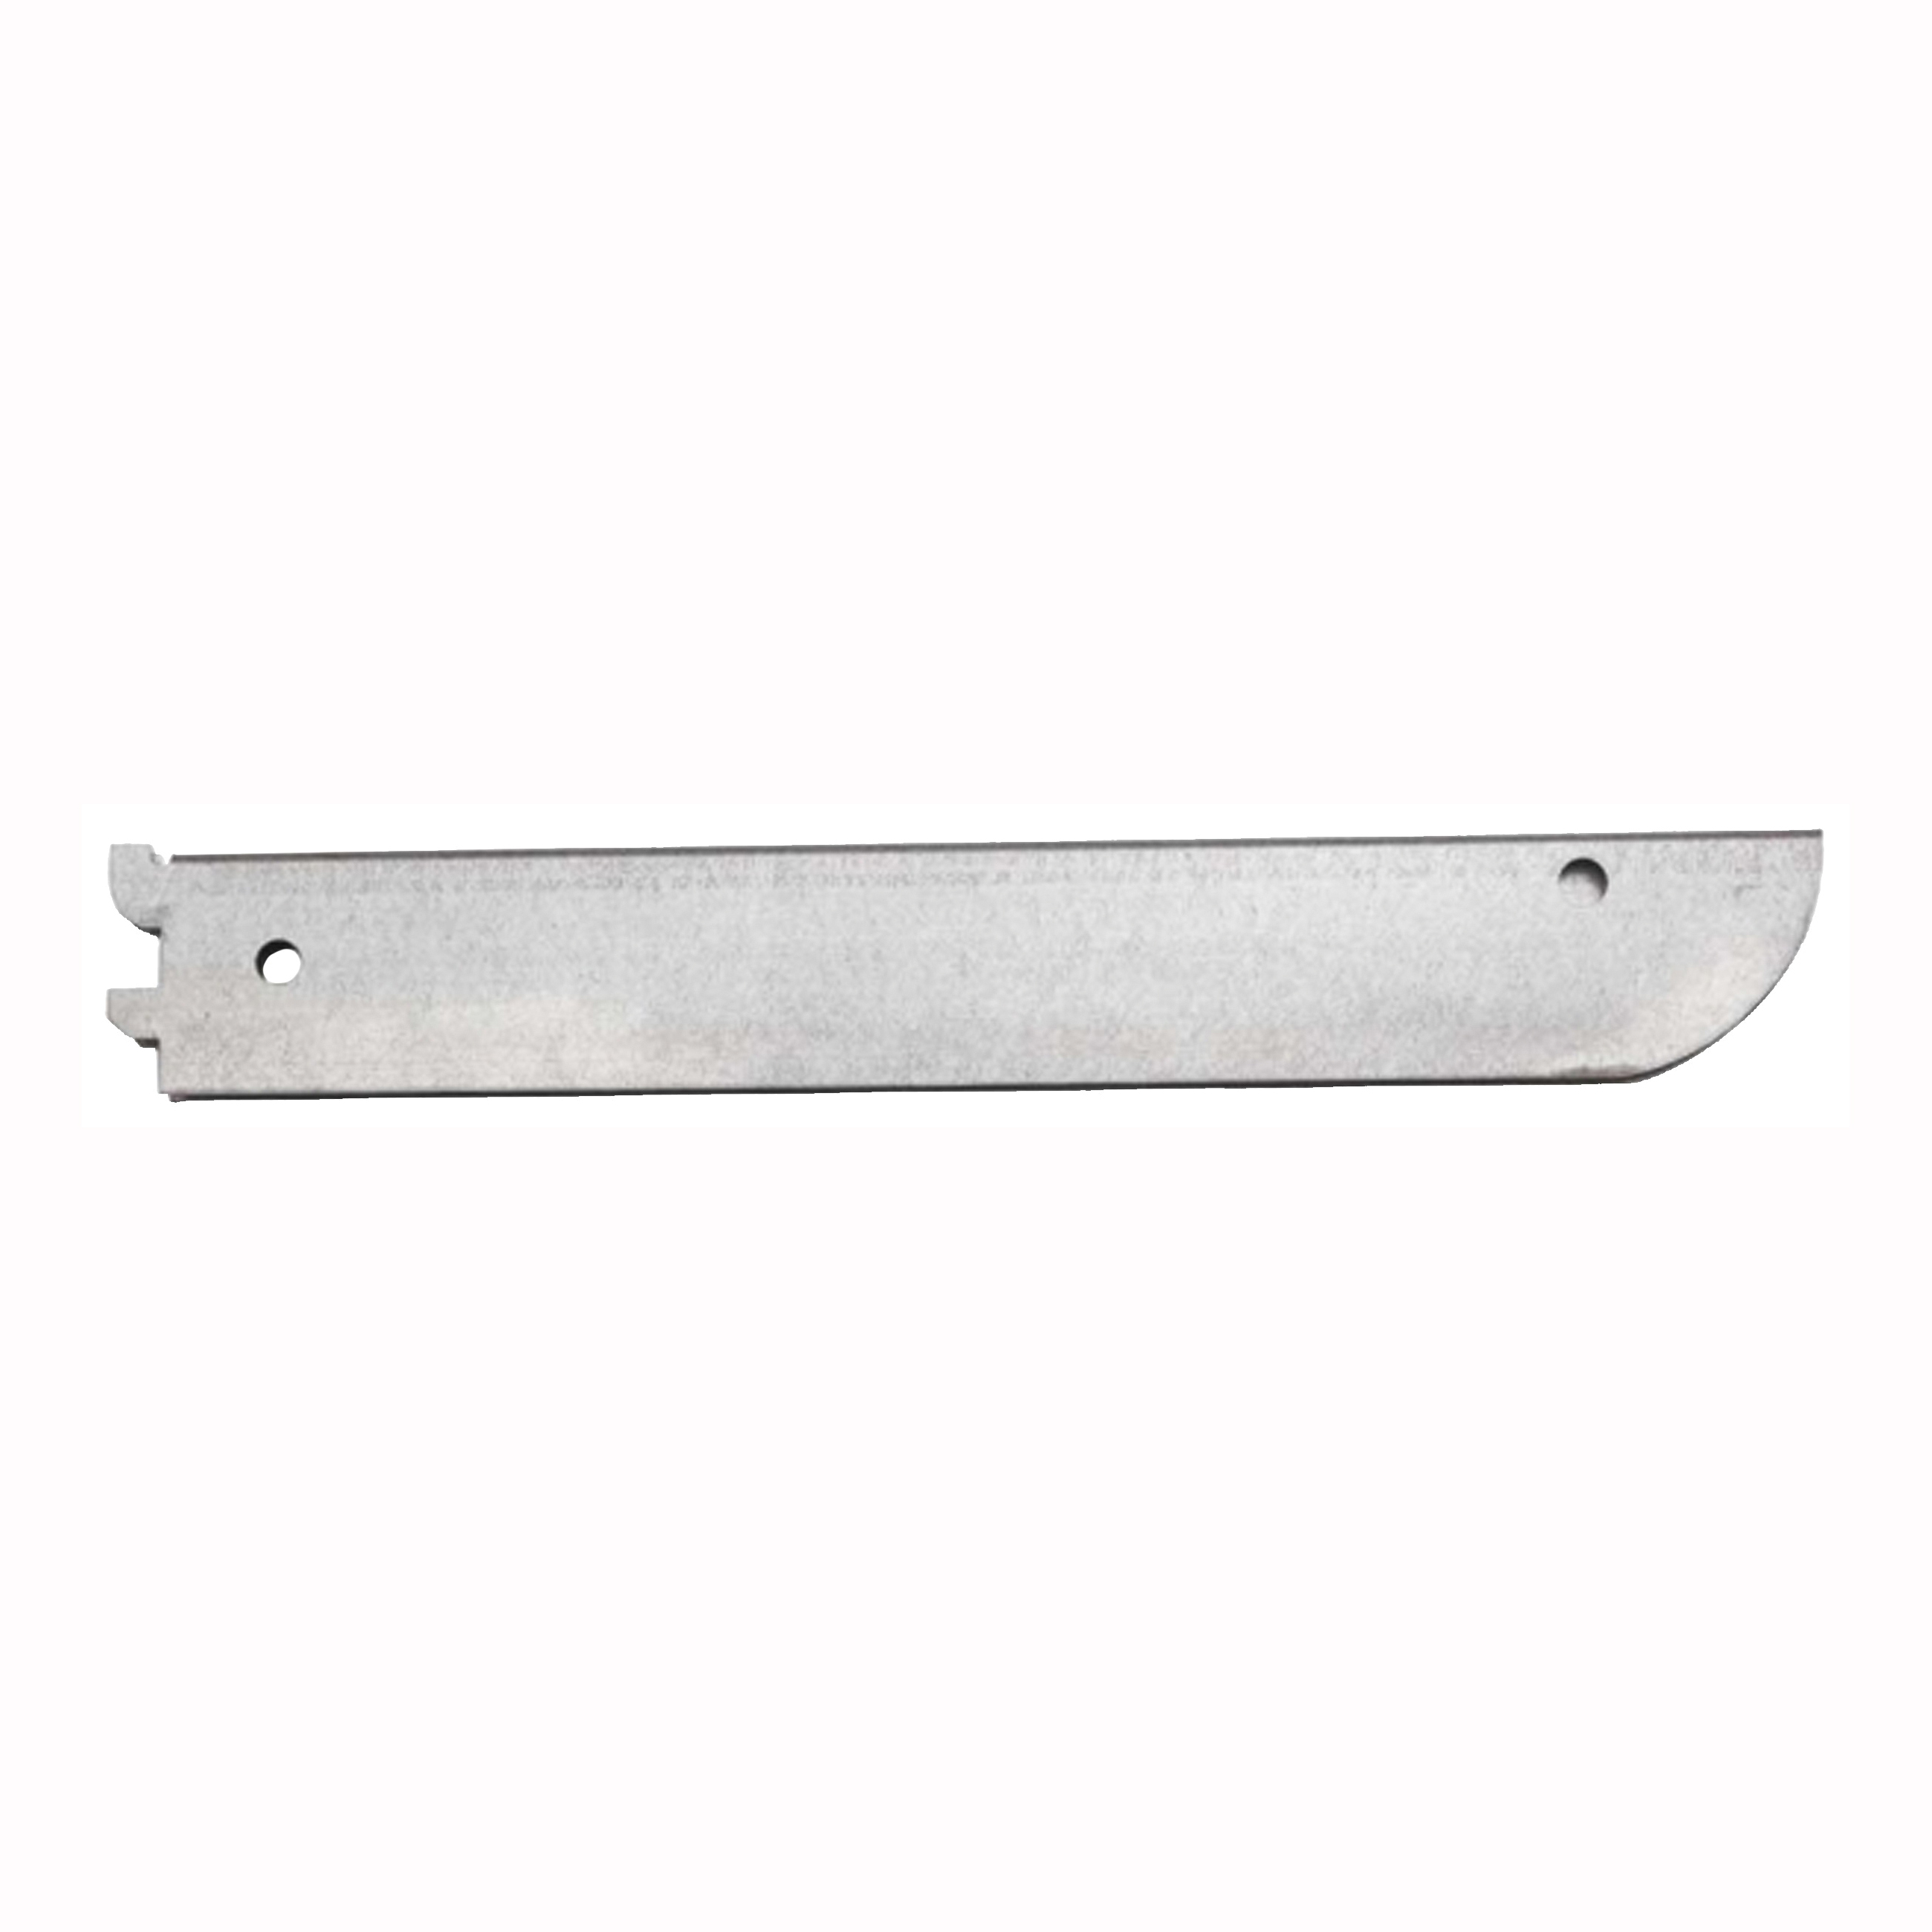 Picture of Knape & Vogt BK-0102-14 Shelf Bracket, 14 in L, Steel, Galvanized